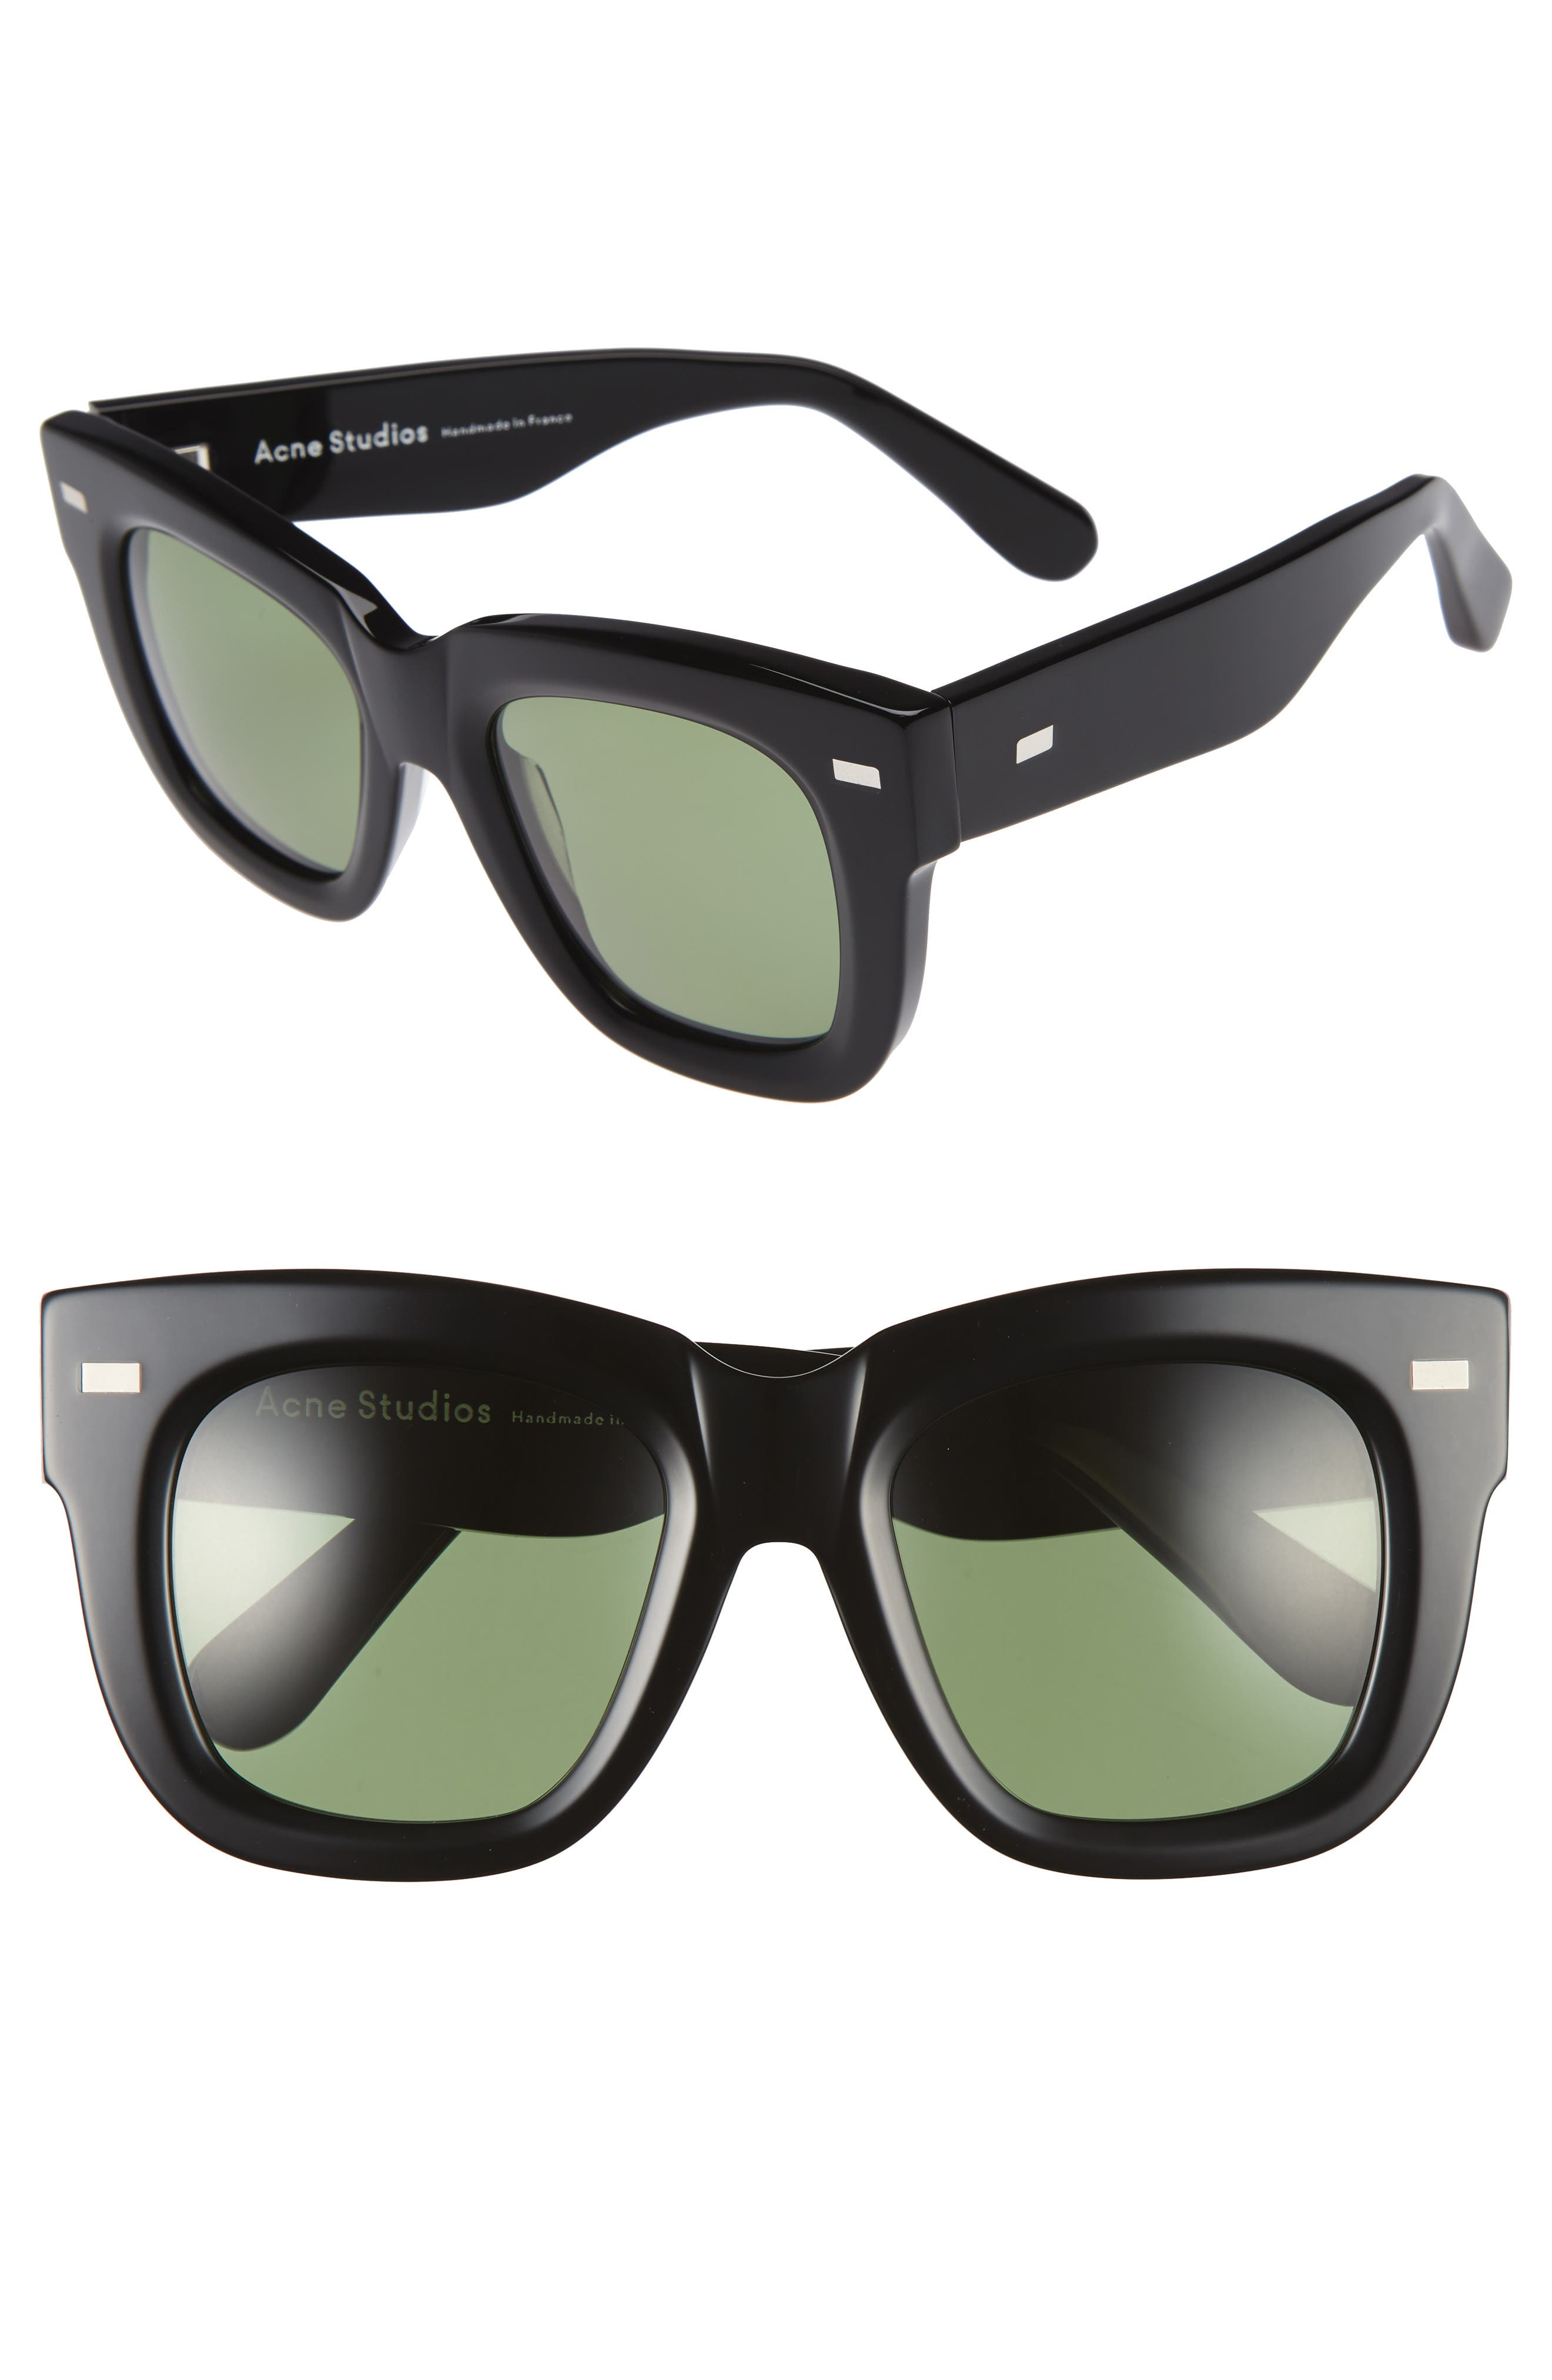 ACNE STUDIOS Library 50mm Sunglasses